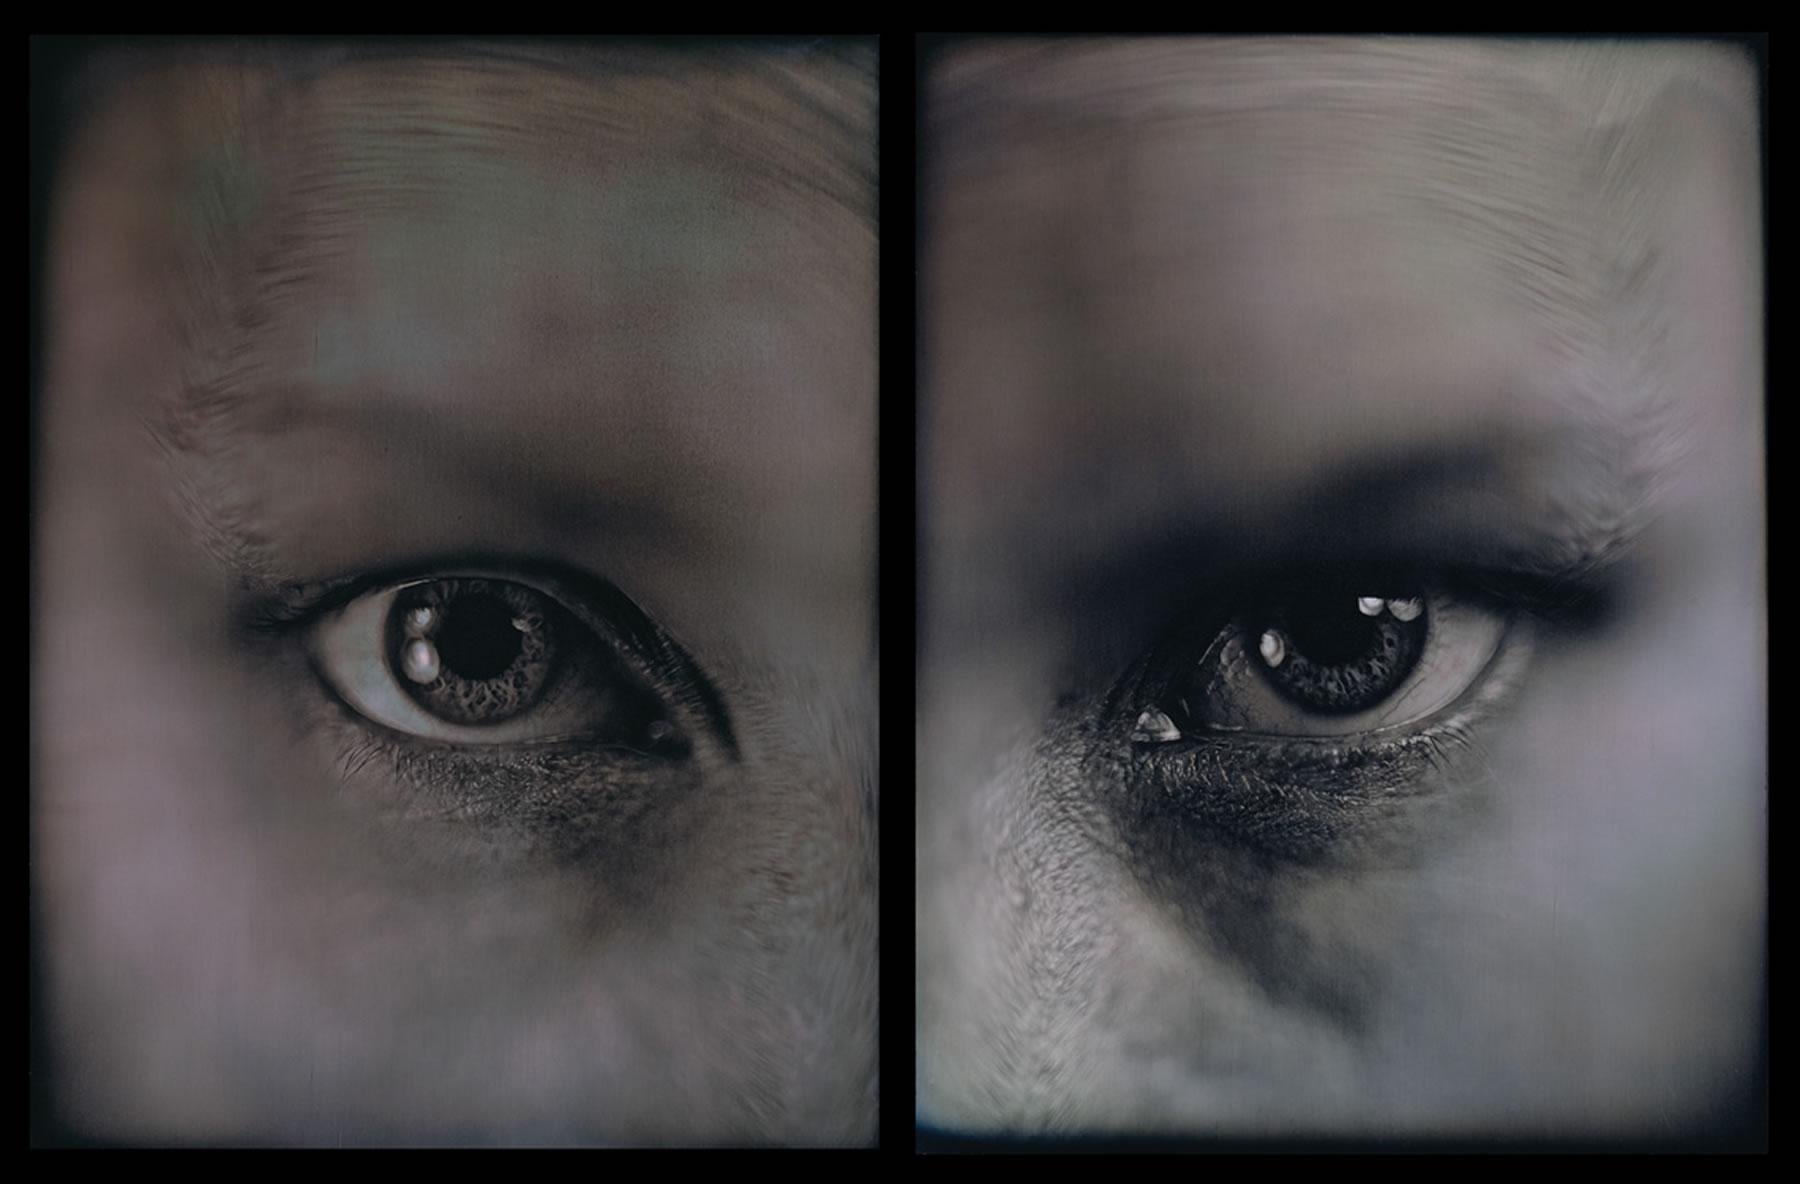 Untitled (Anatomical Study), 2001, 8 1/2 x 13 1/2, (2 Whole Plate Daguerreotypes)